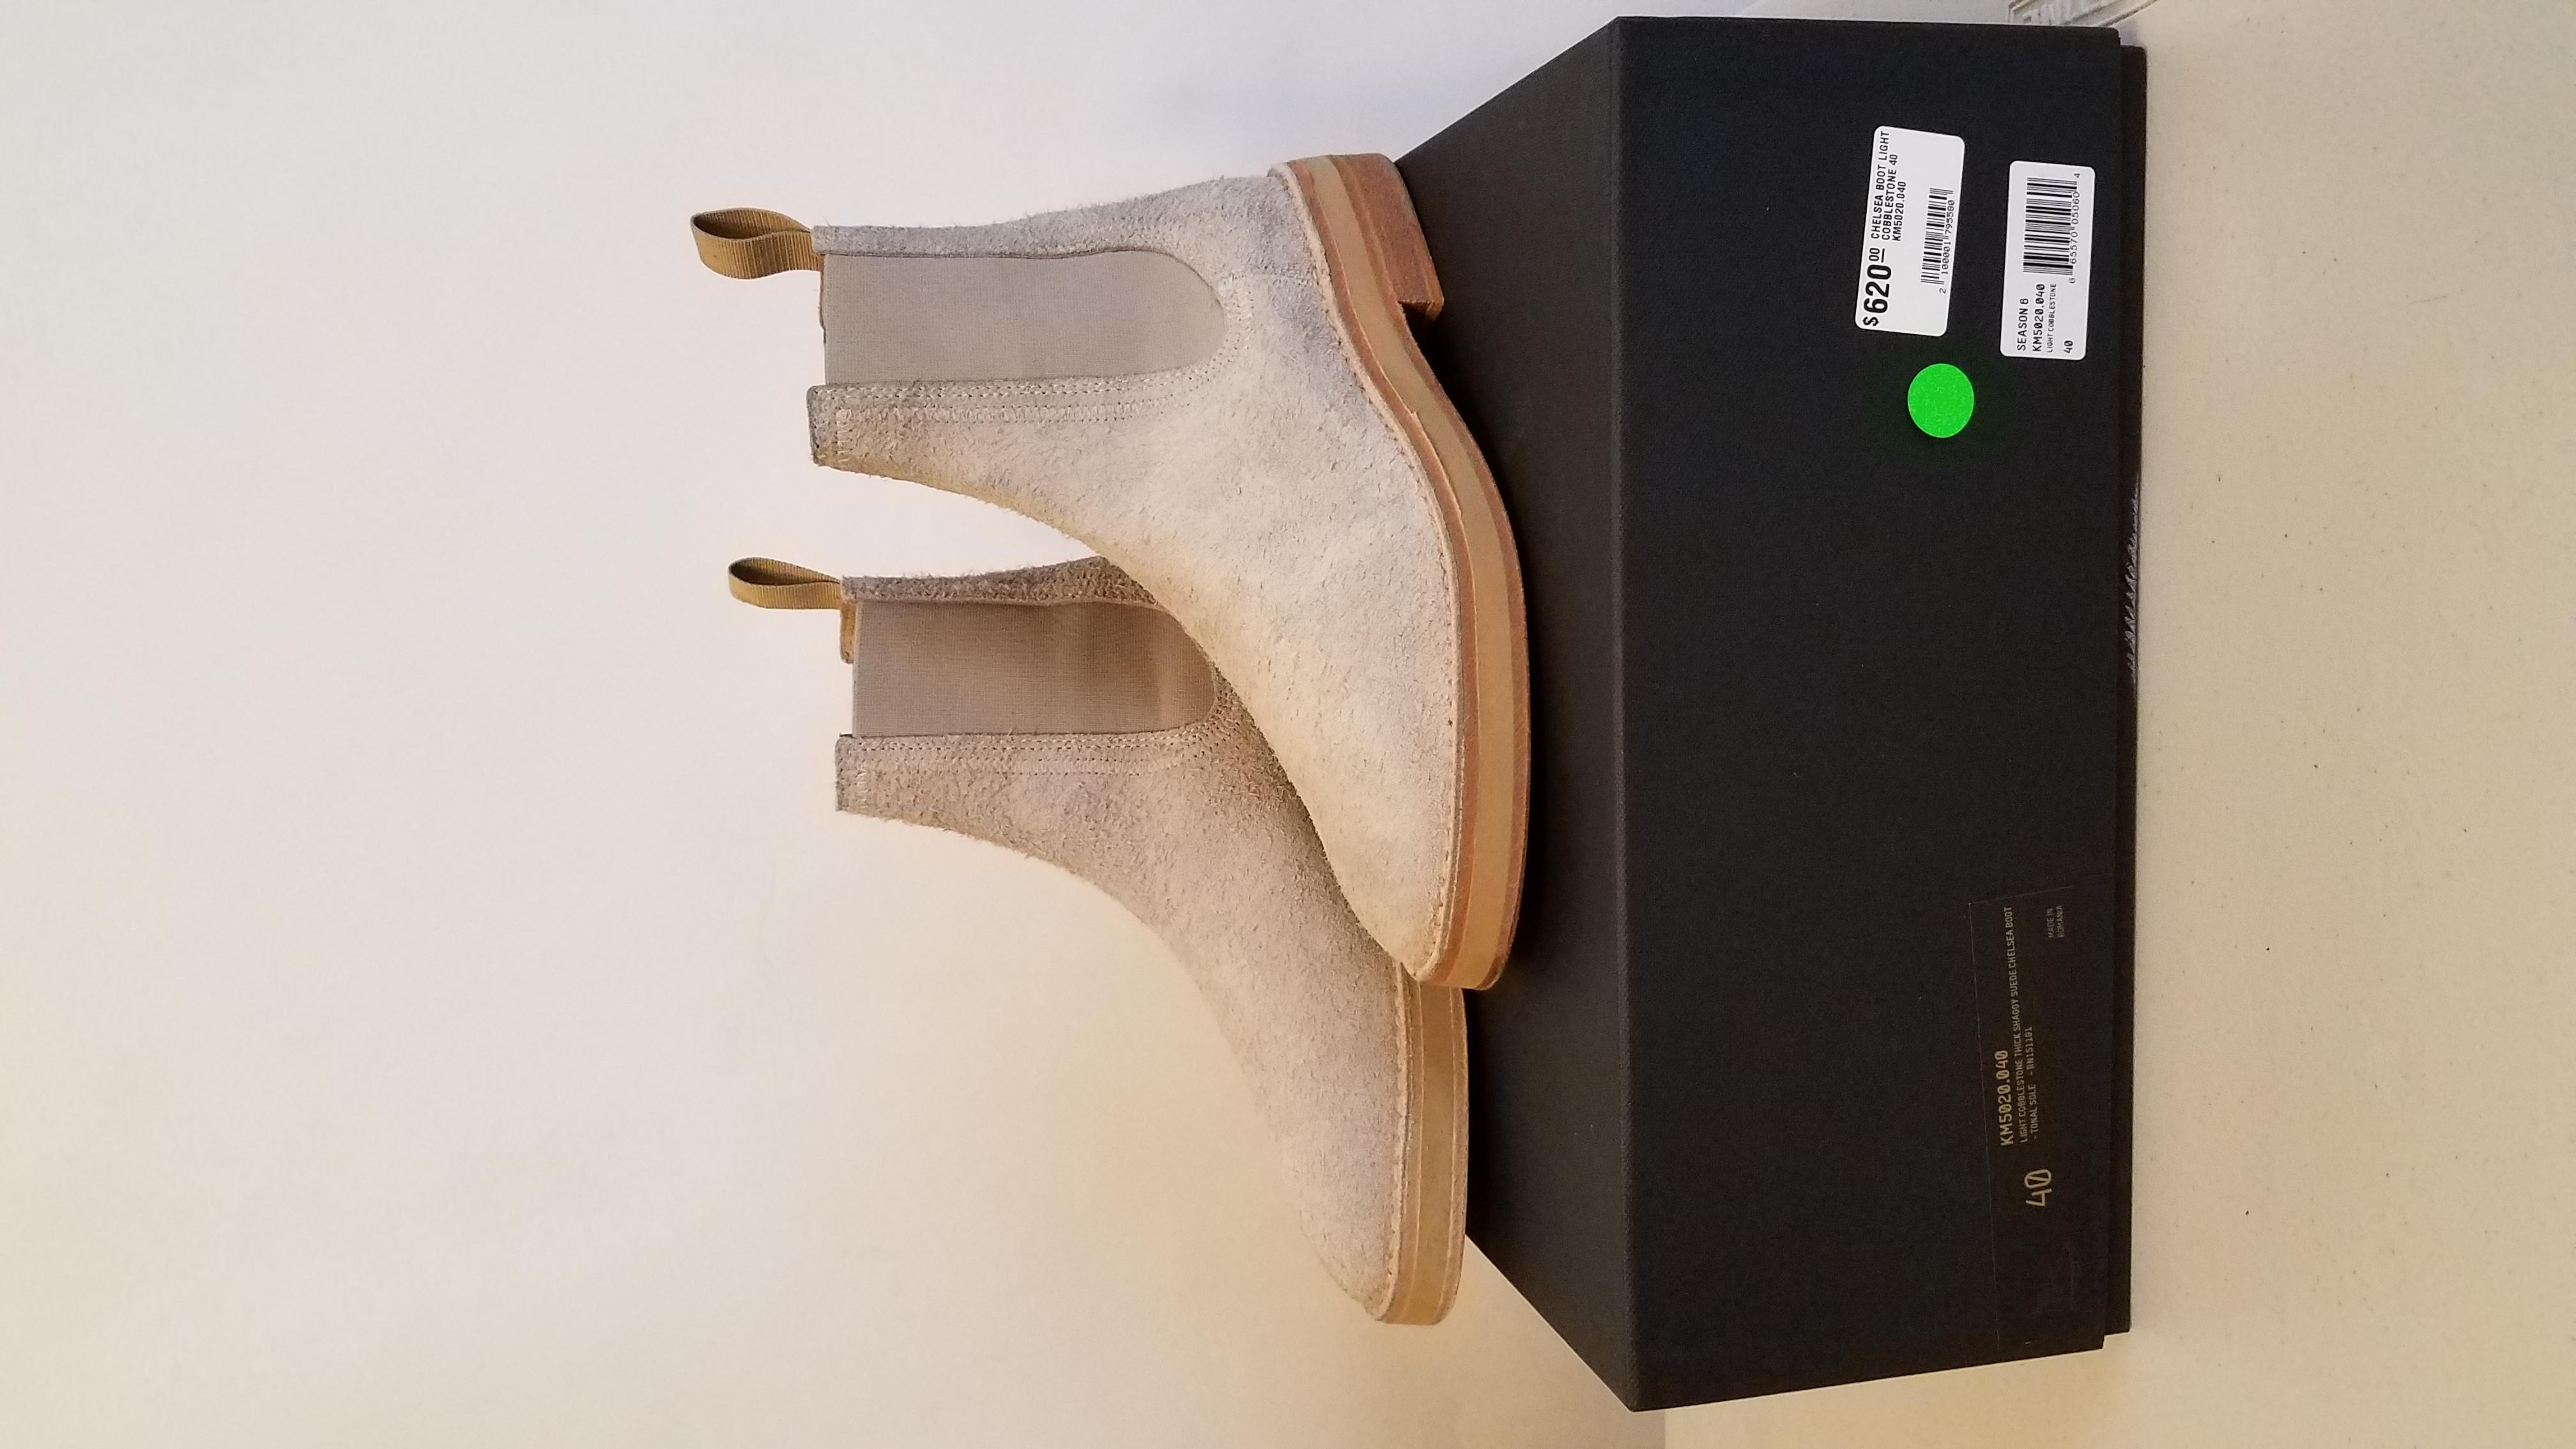 b80c4242615 Yeezy Season Chelsea Boots Cobblestone season 6 Size 7.5 - Boots for Sale -  Grailed